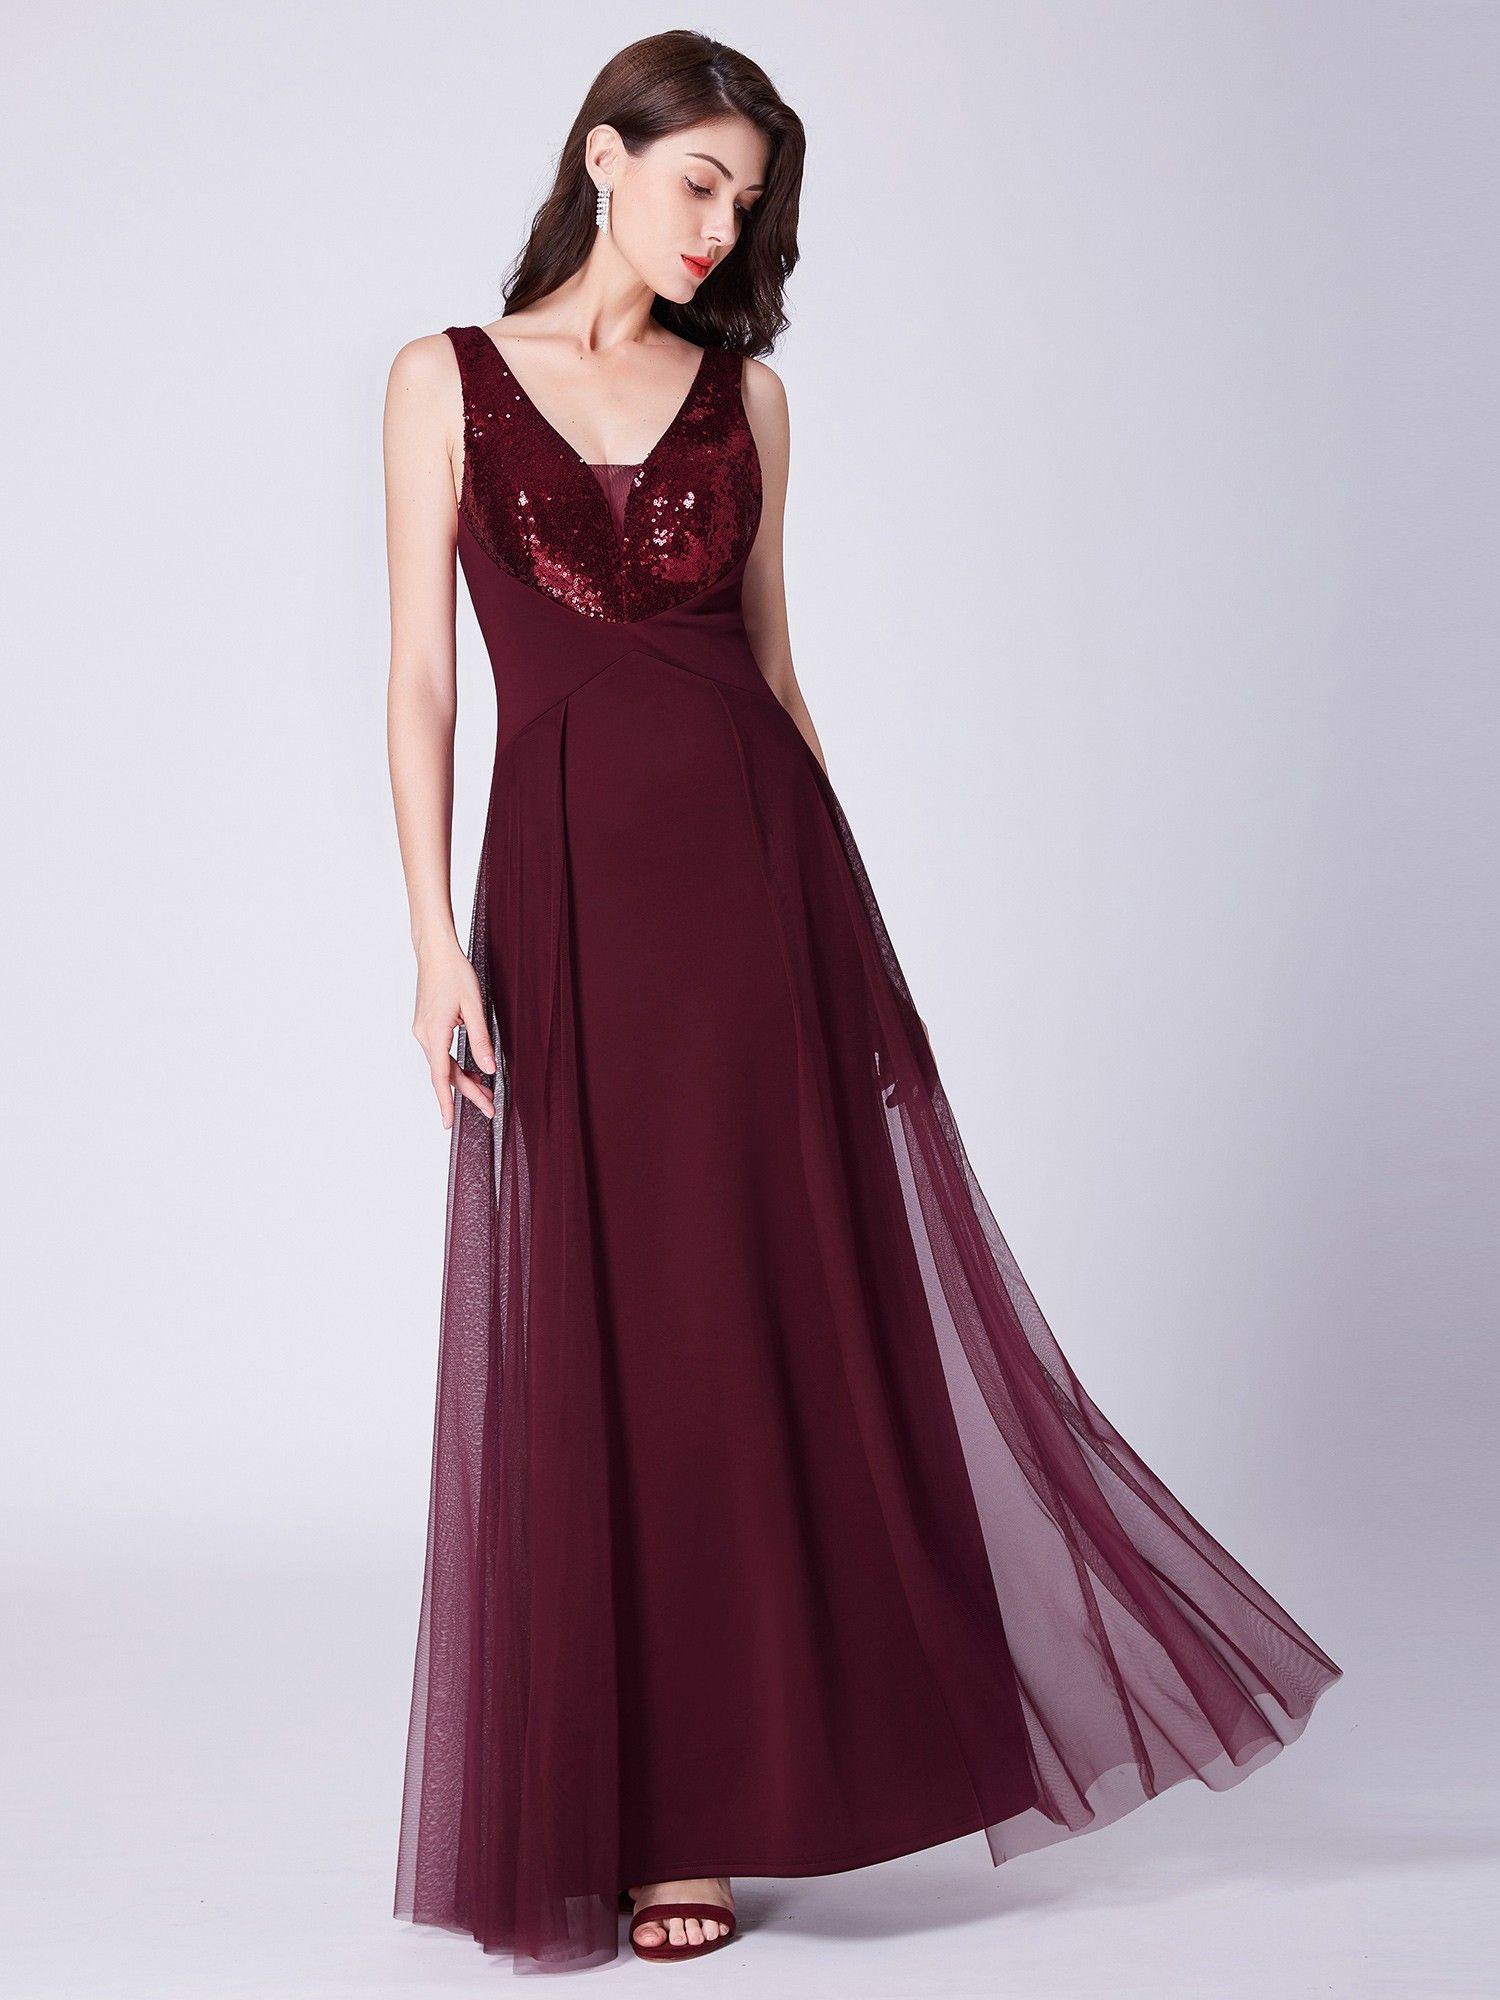 https://www.ever-pretty.com/us/floor-length-burgundy-sequin-evening-dress-ep07453.html?utm_source=blog&utm_medium=post&utm_campaign=1142